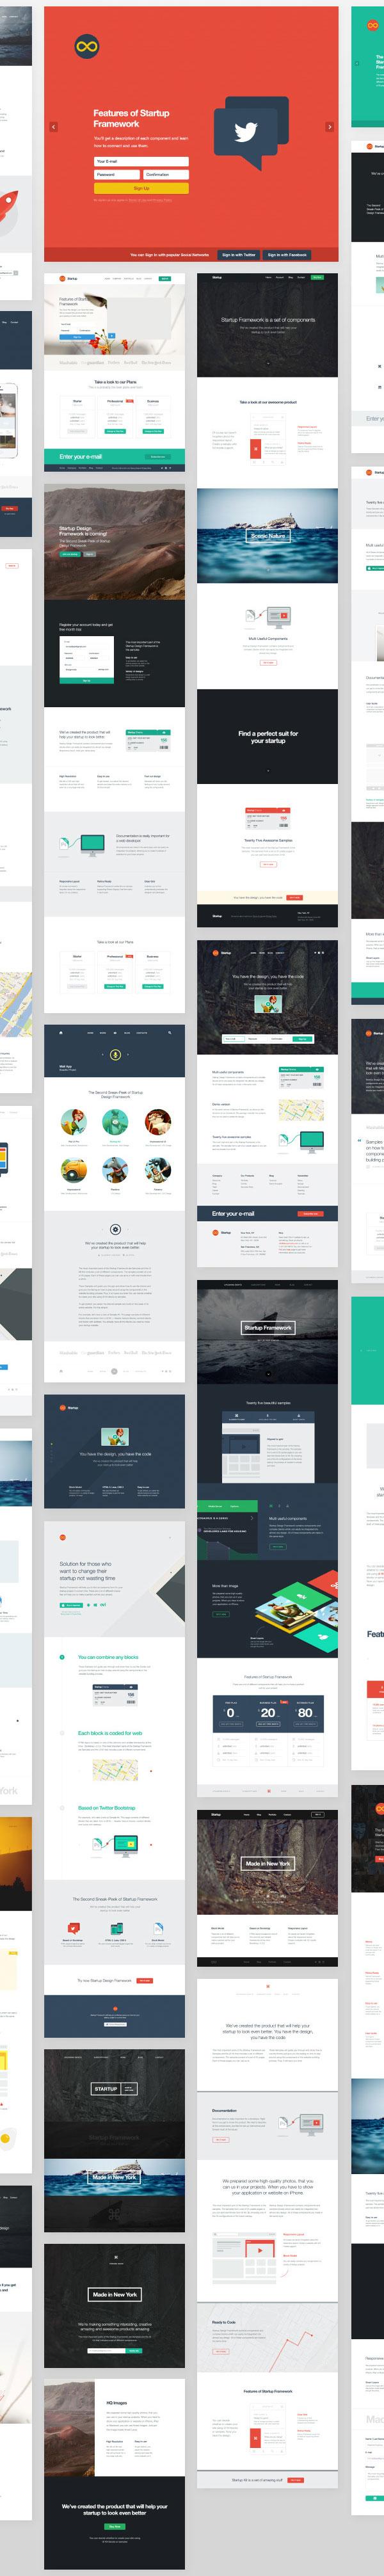 Startup Design Framework by Designmodo